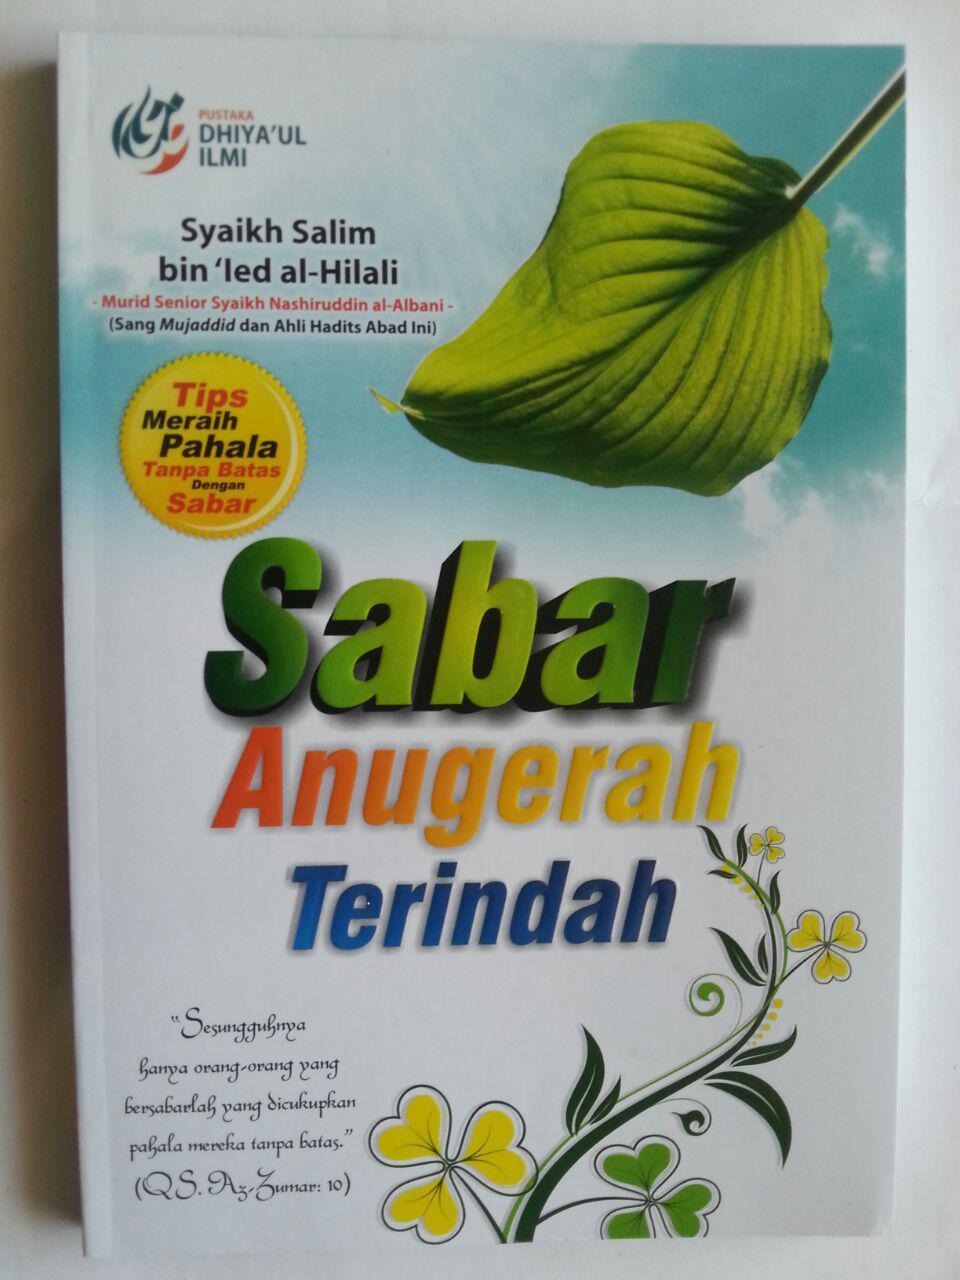 Buku Sabar Anugerah Terindah Tips Meraih Pahala Tanpa Batas cover 2